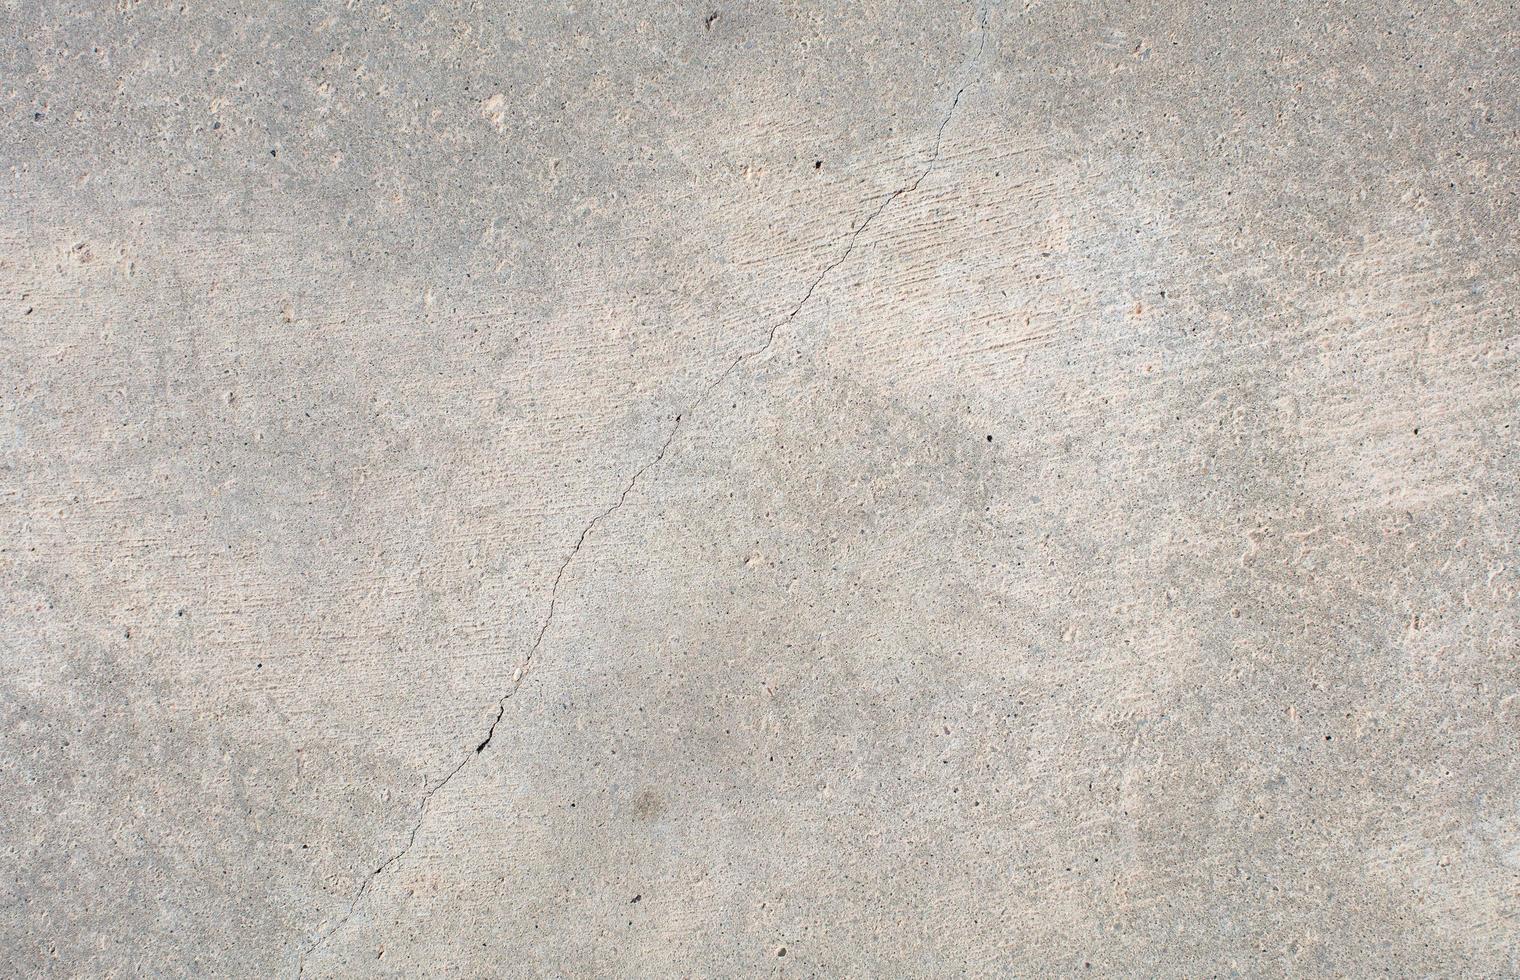 betonnen muur textuur foto